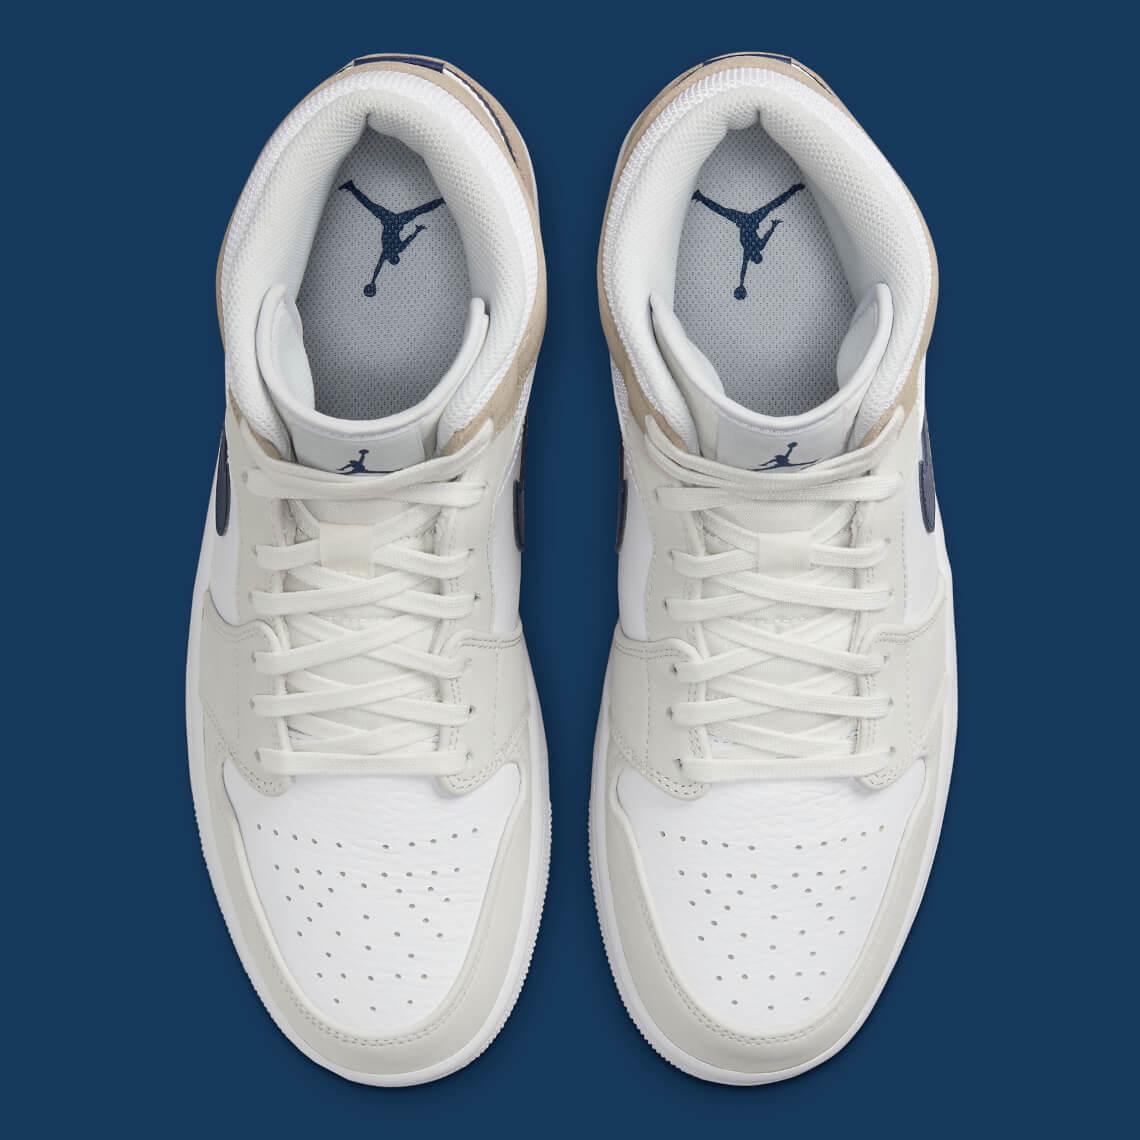 zapatillas Air Jordan 1 mid White tan navy 2021